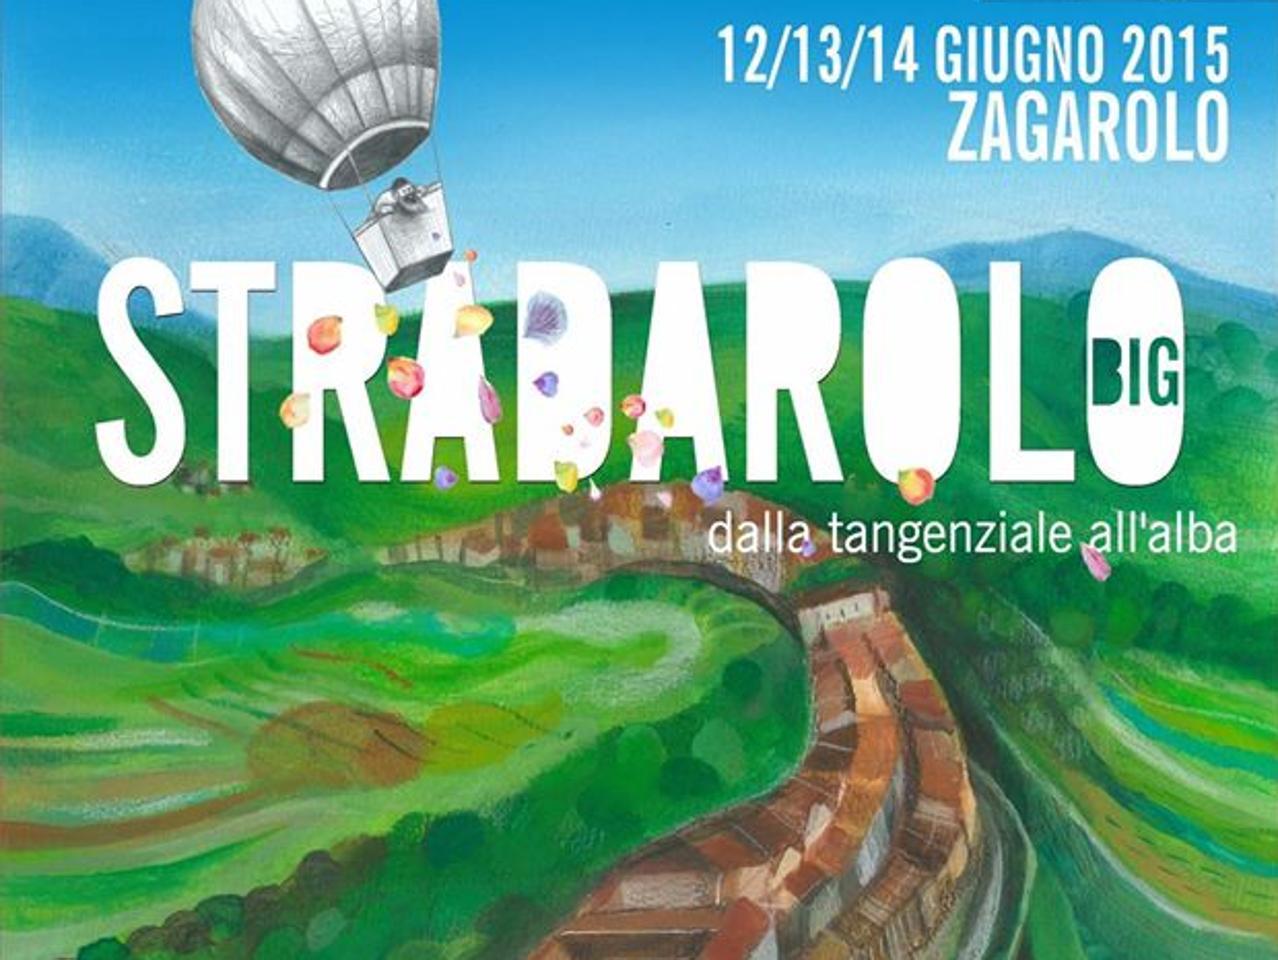 manifesto_stradarolo-k2dB-1280x960@Produzione.jpg